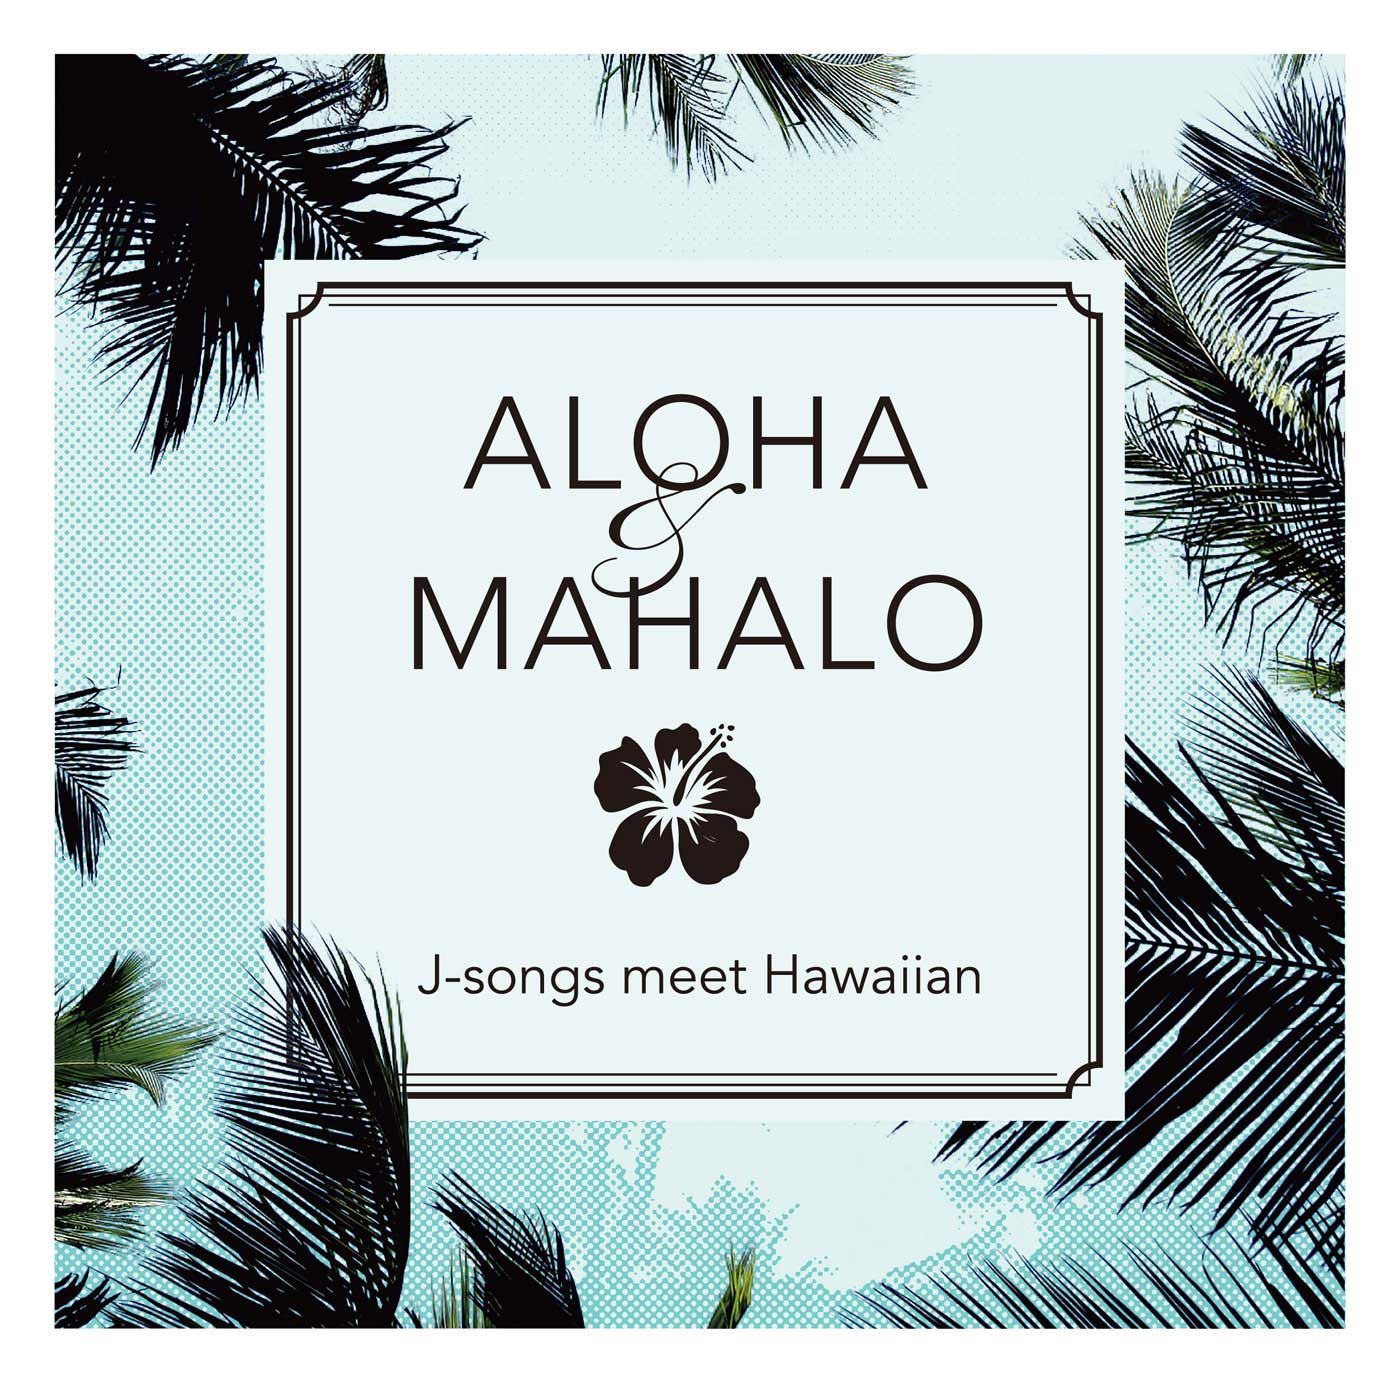 「ALOHA&MAHALO J-songs meet Hawaiian」